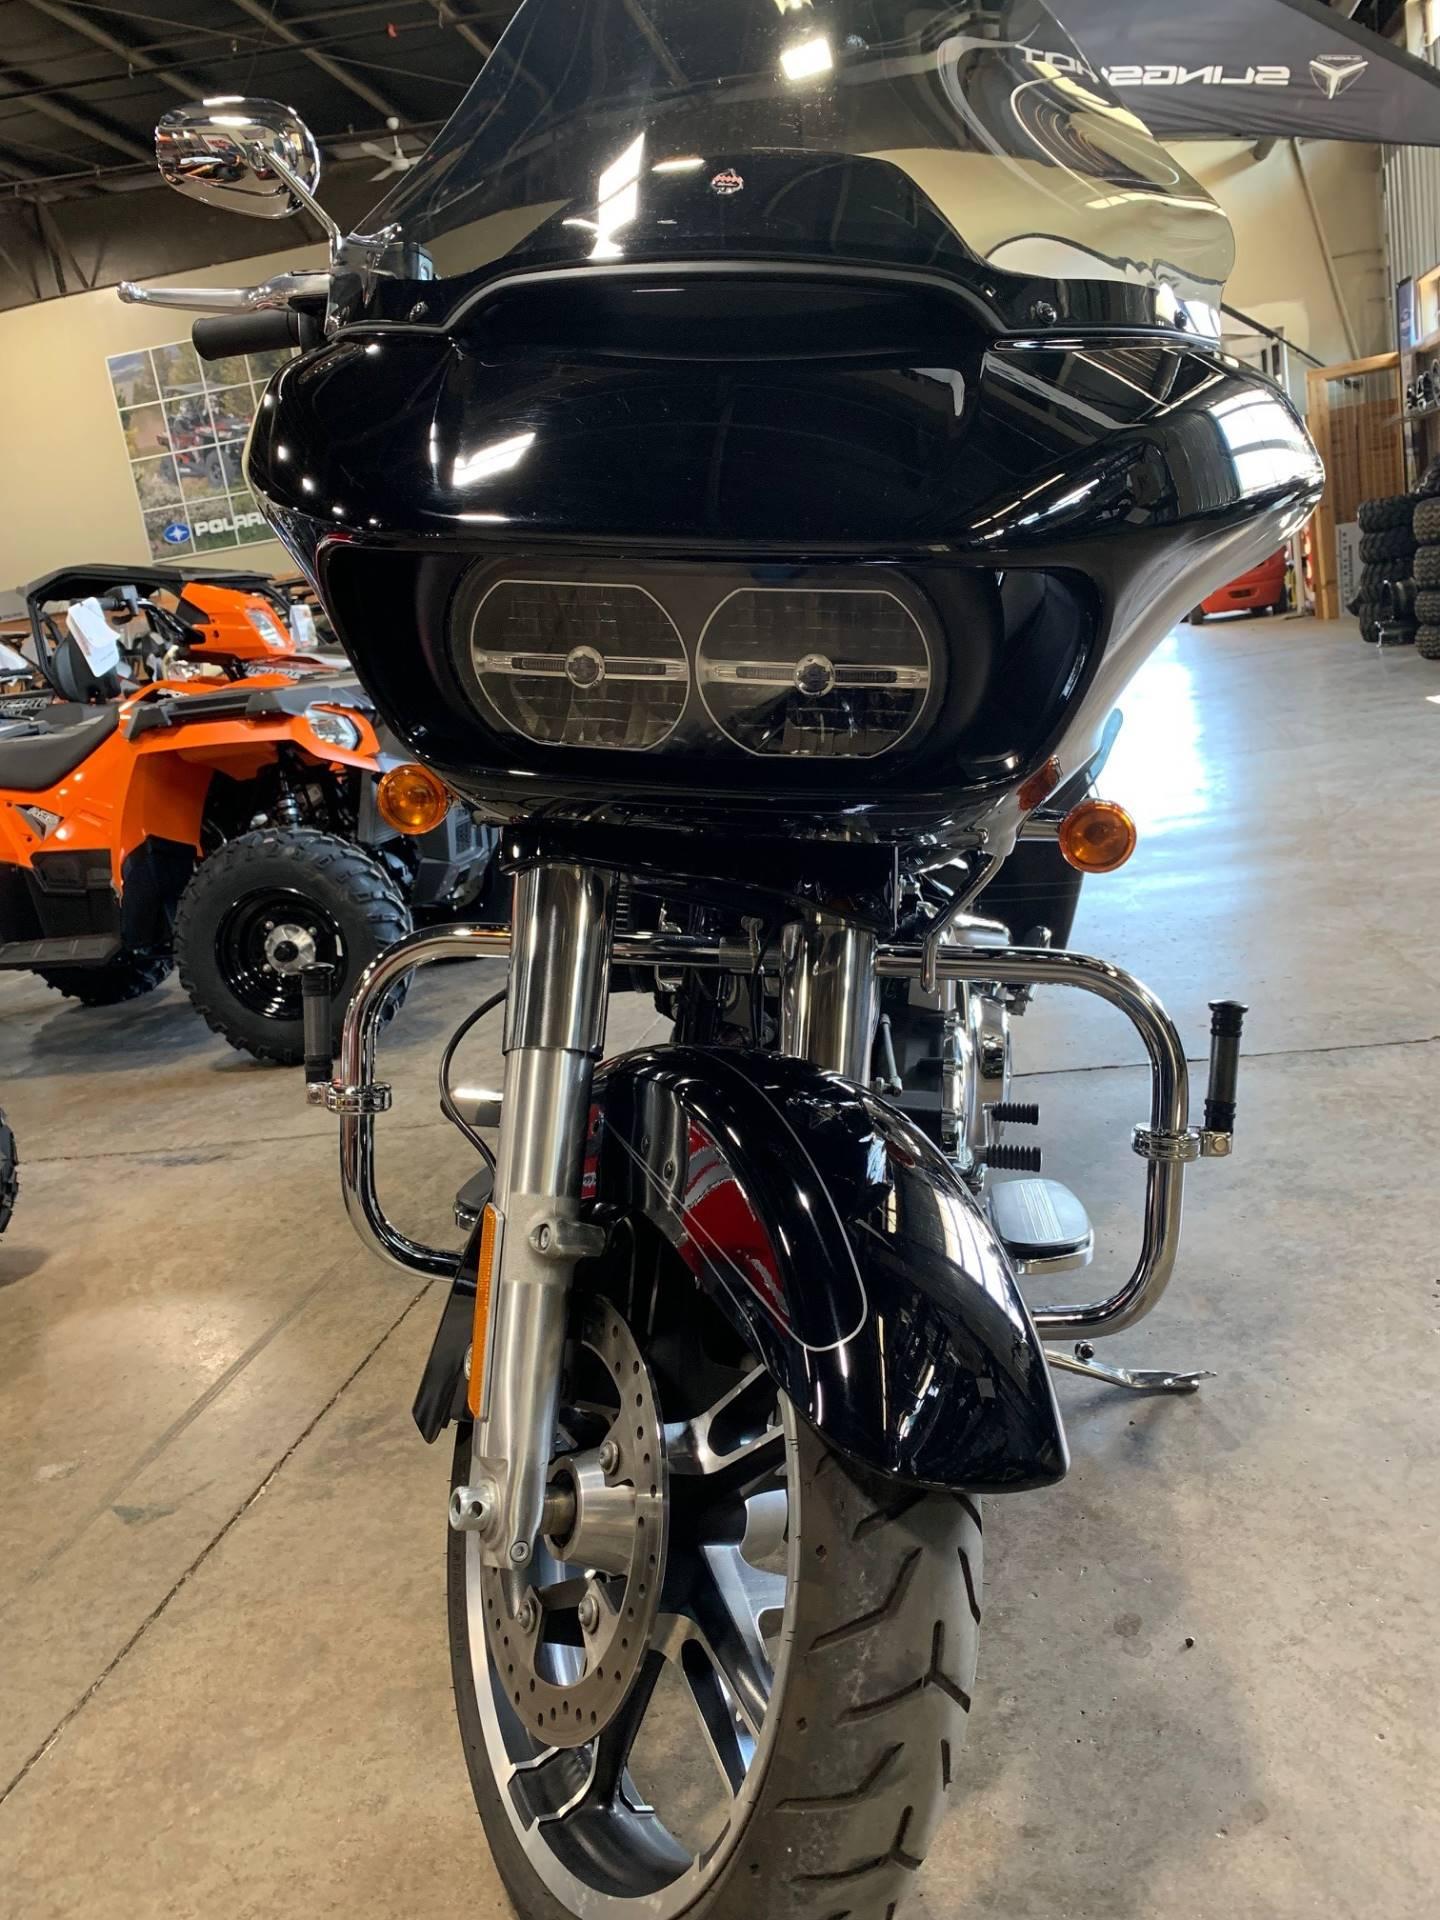 2015 Harley-Davidson ROAD GLIDE SPECIAL 10